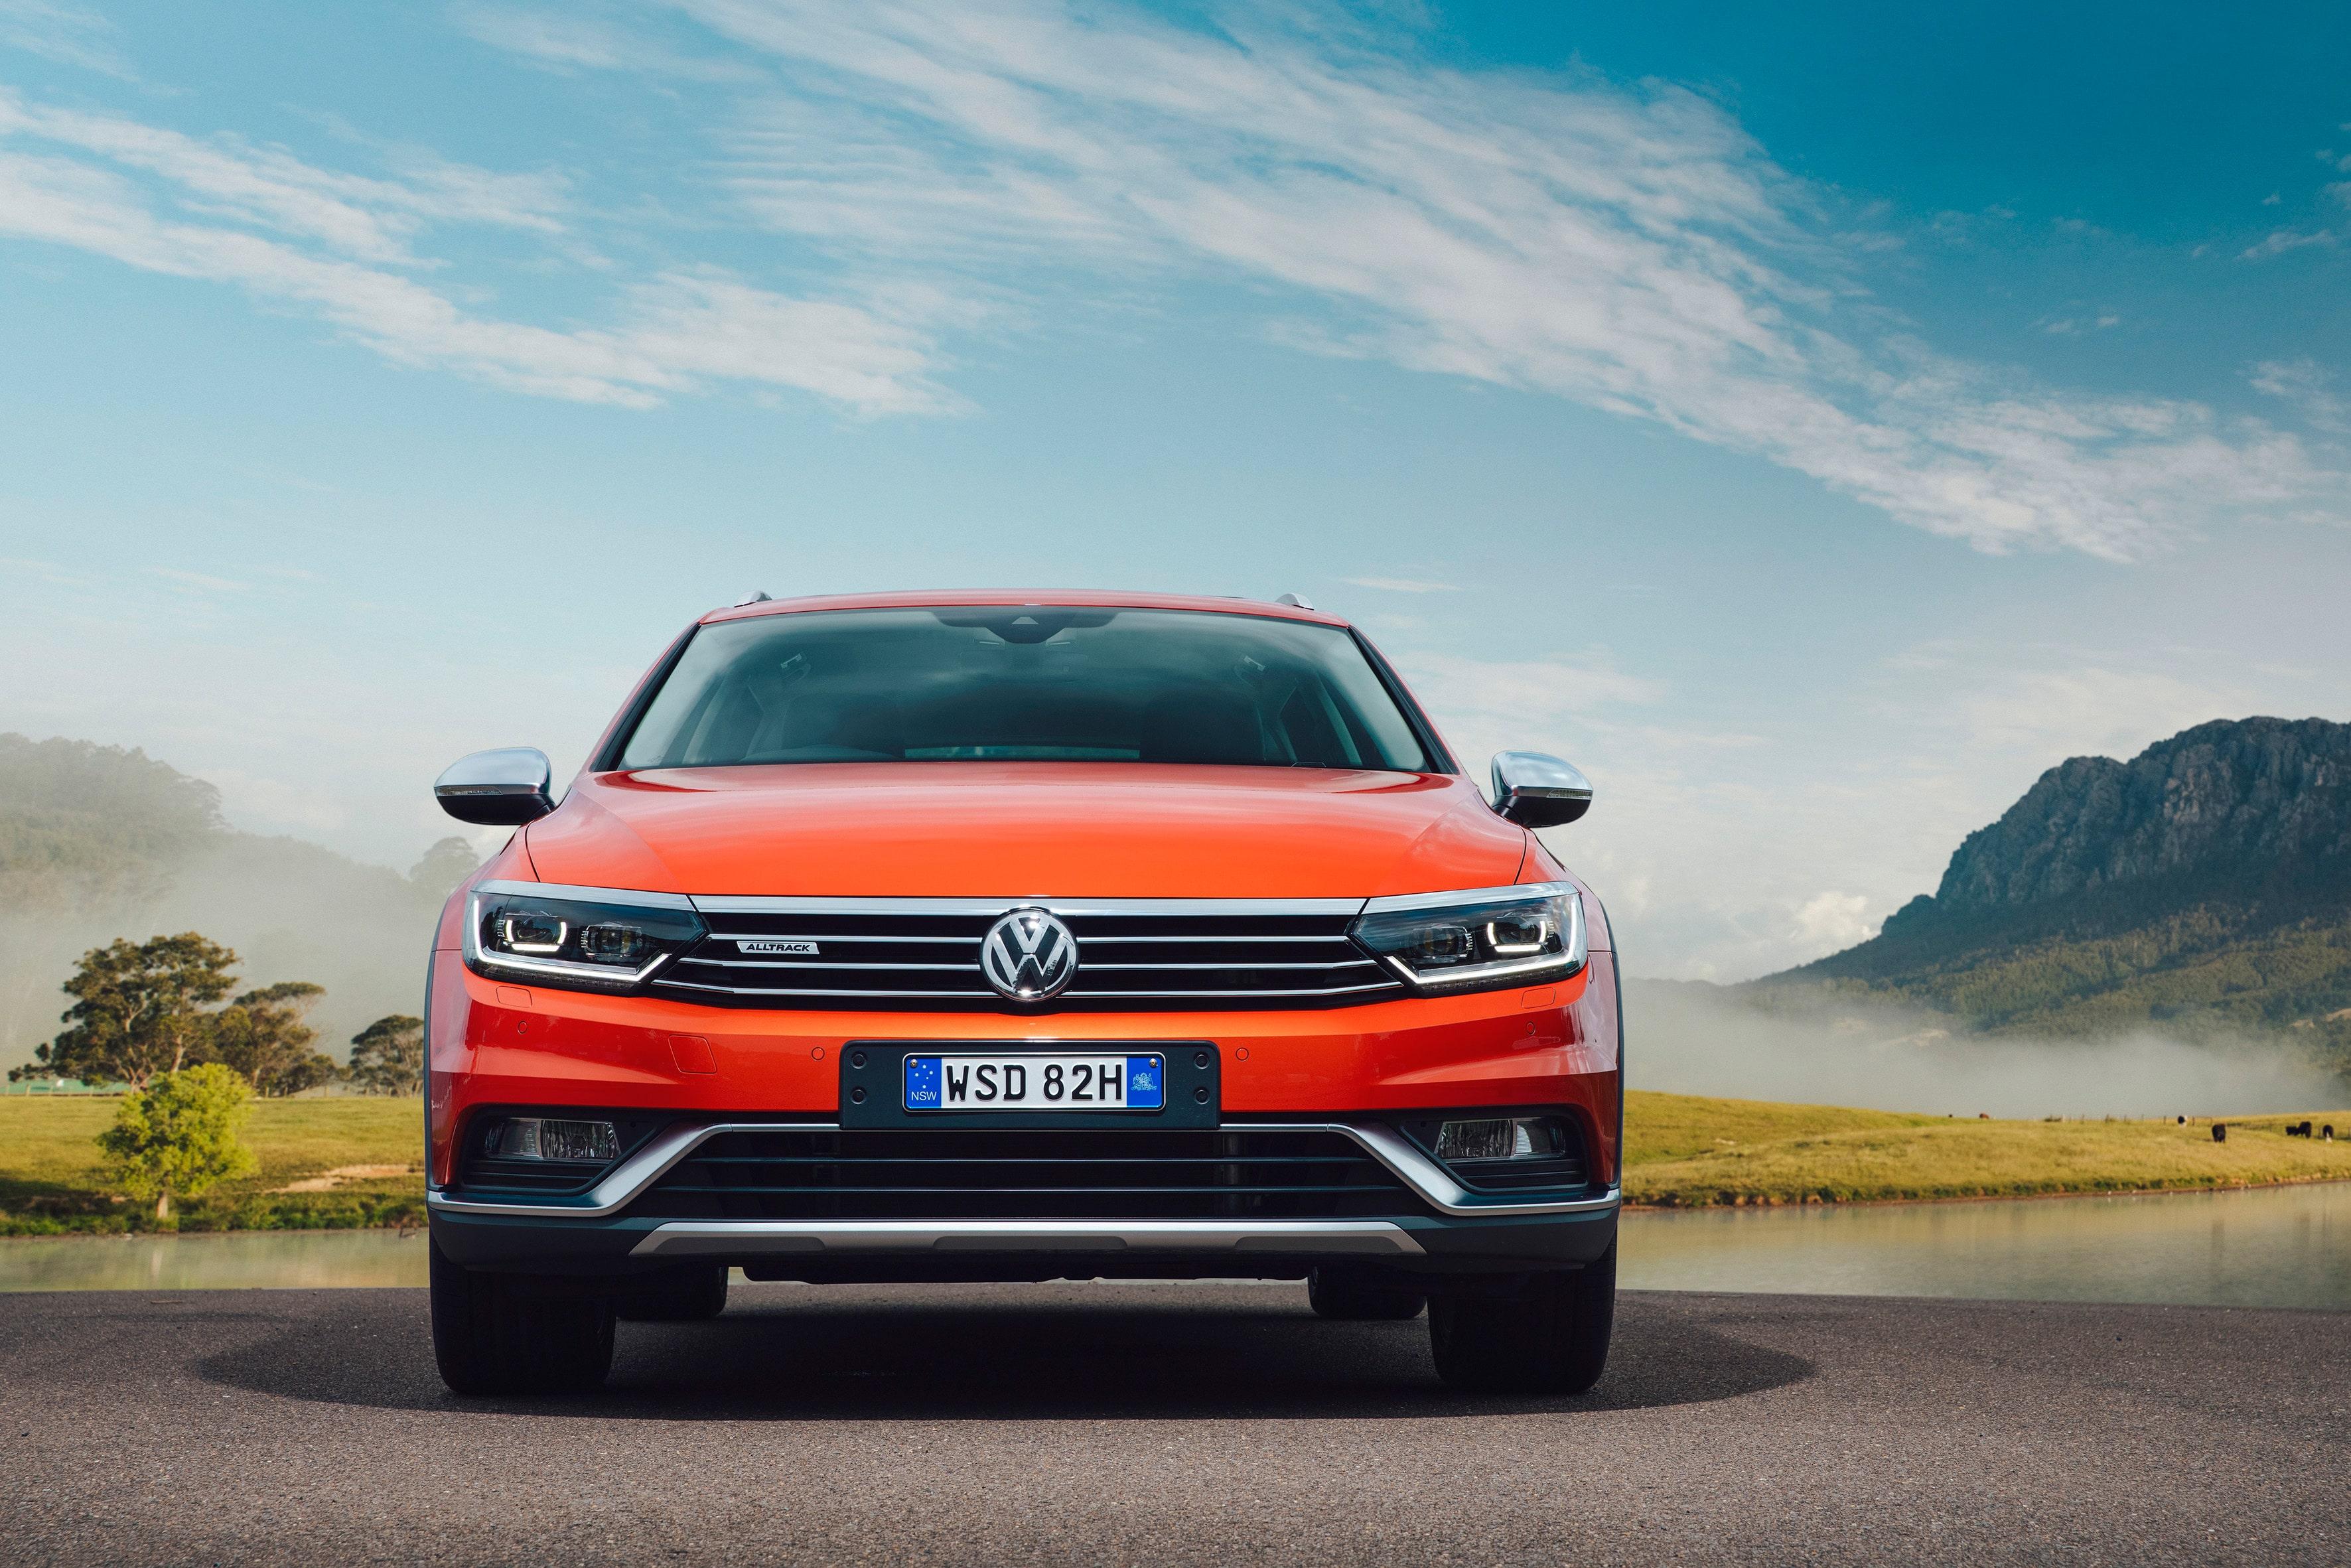 Volkswagen Passat B8 Alltrack Wallpaper